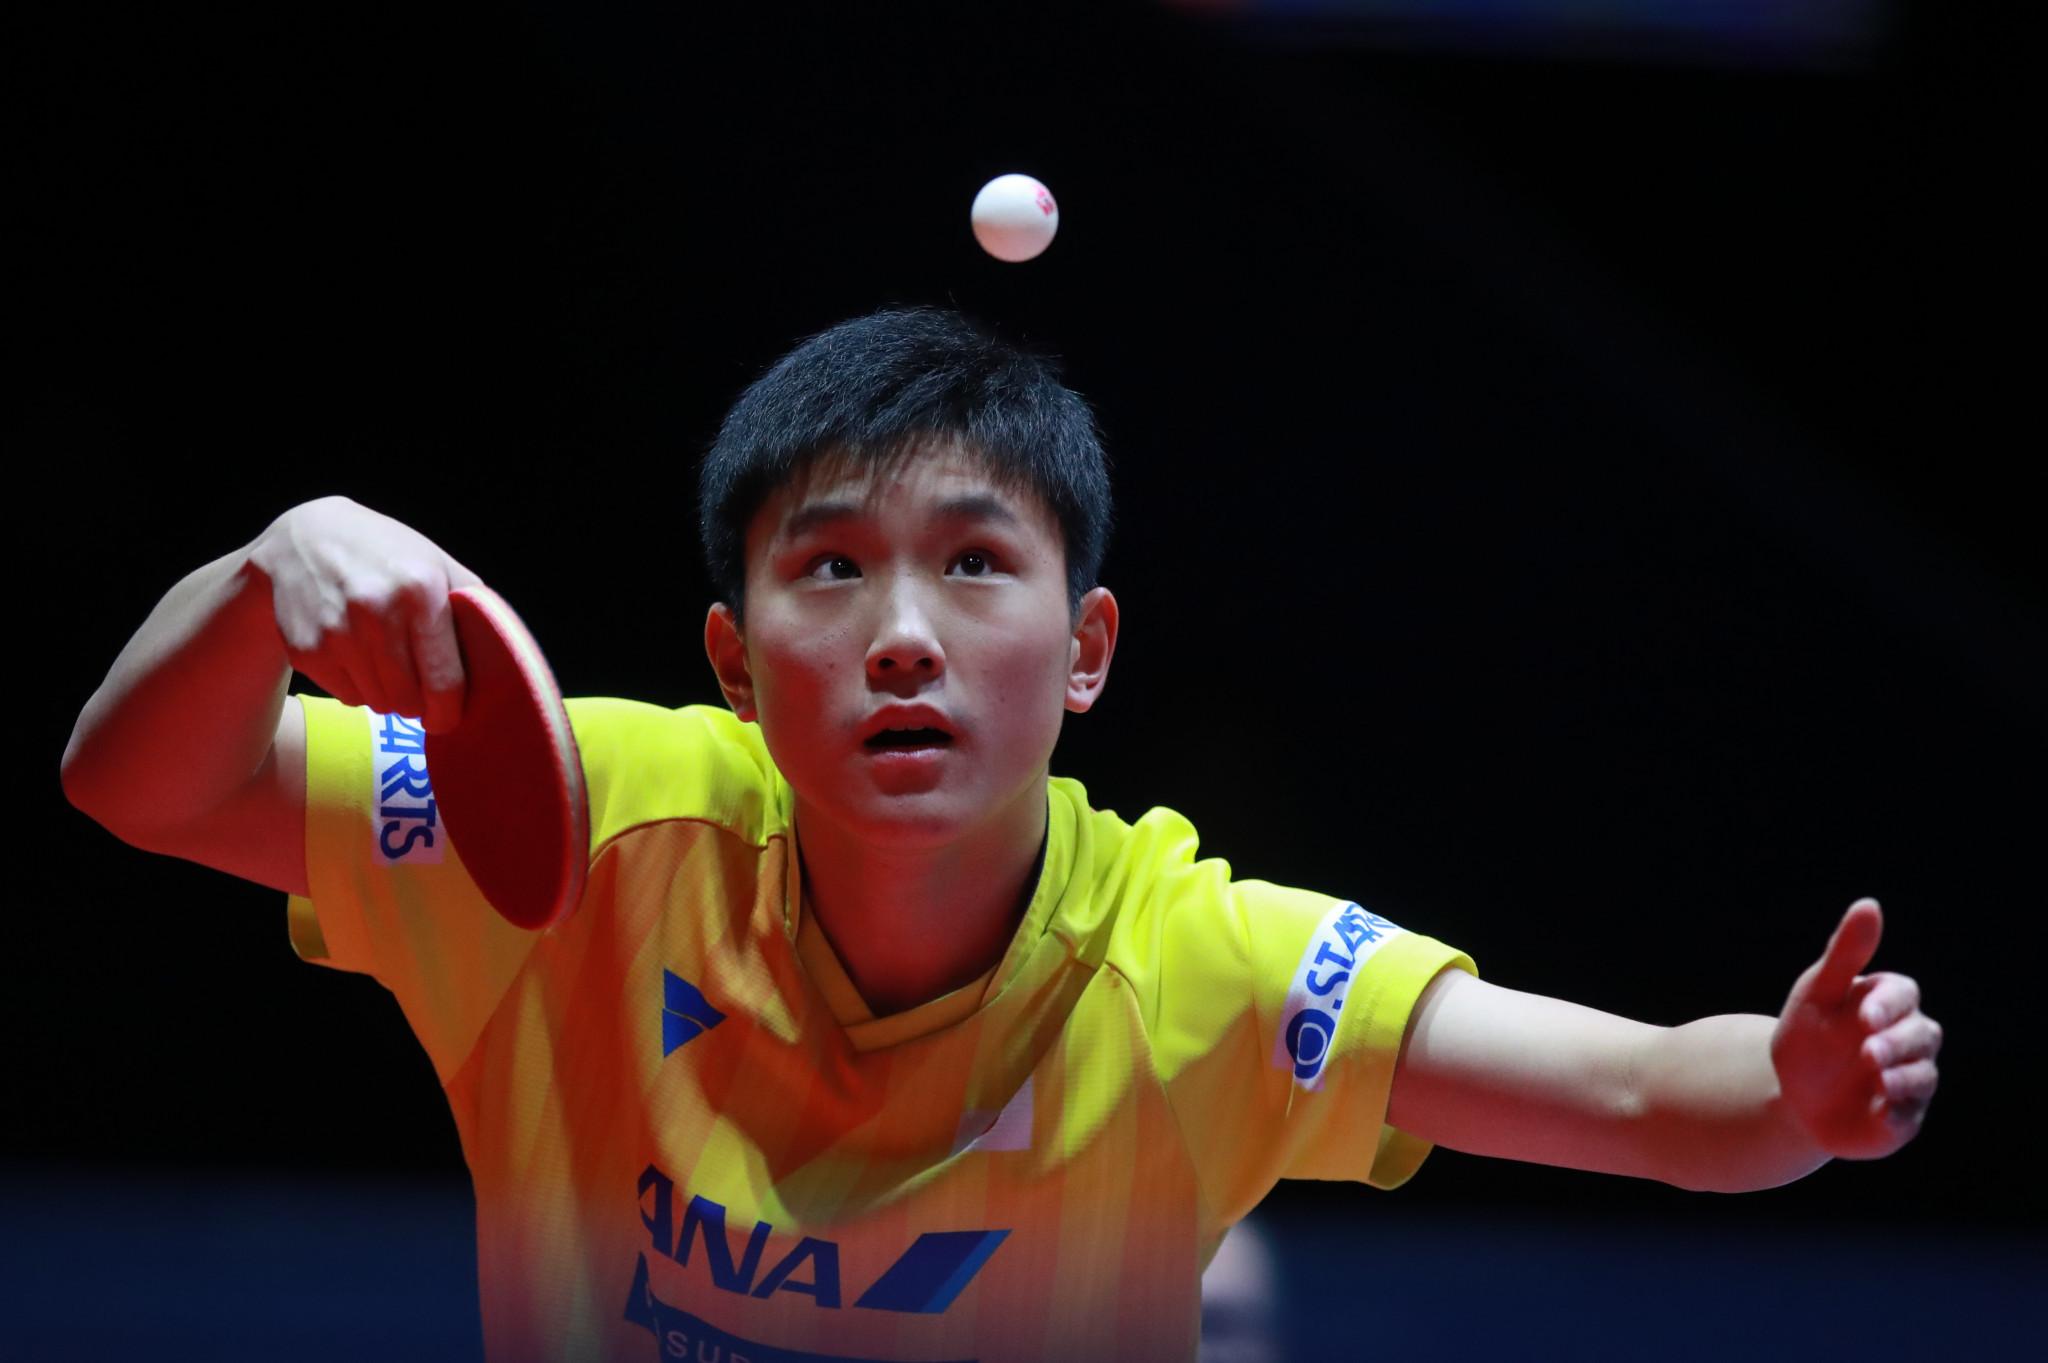 ITTF announces World Tour schedule for 2020